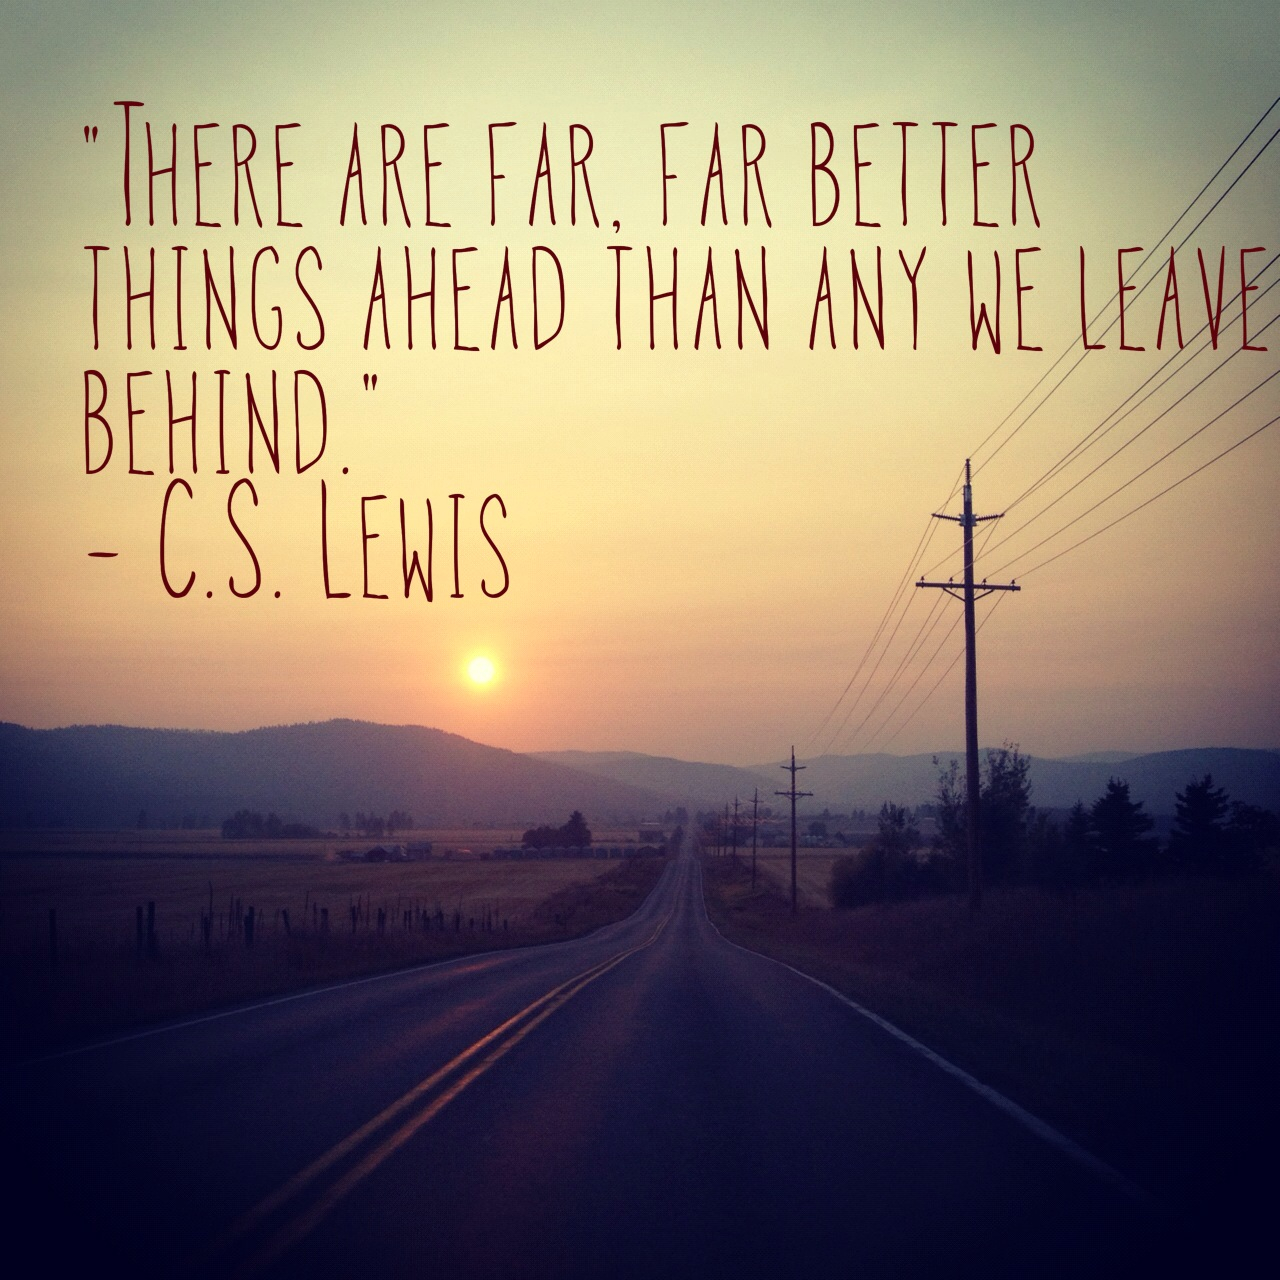 Life Quotes: Cs Lewis Quotes On Life. QuotesGram